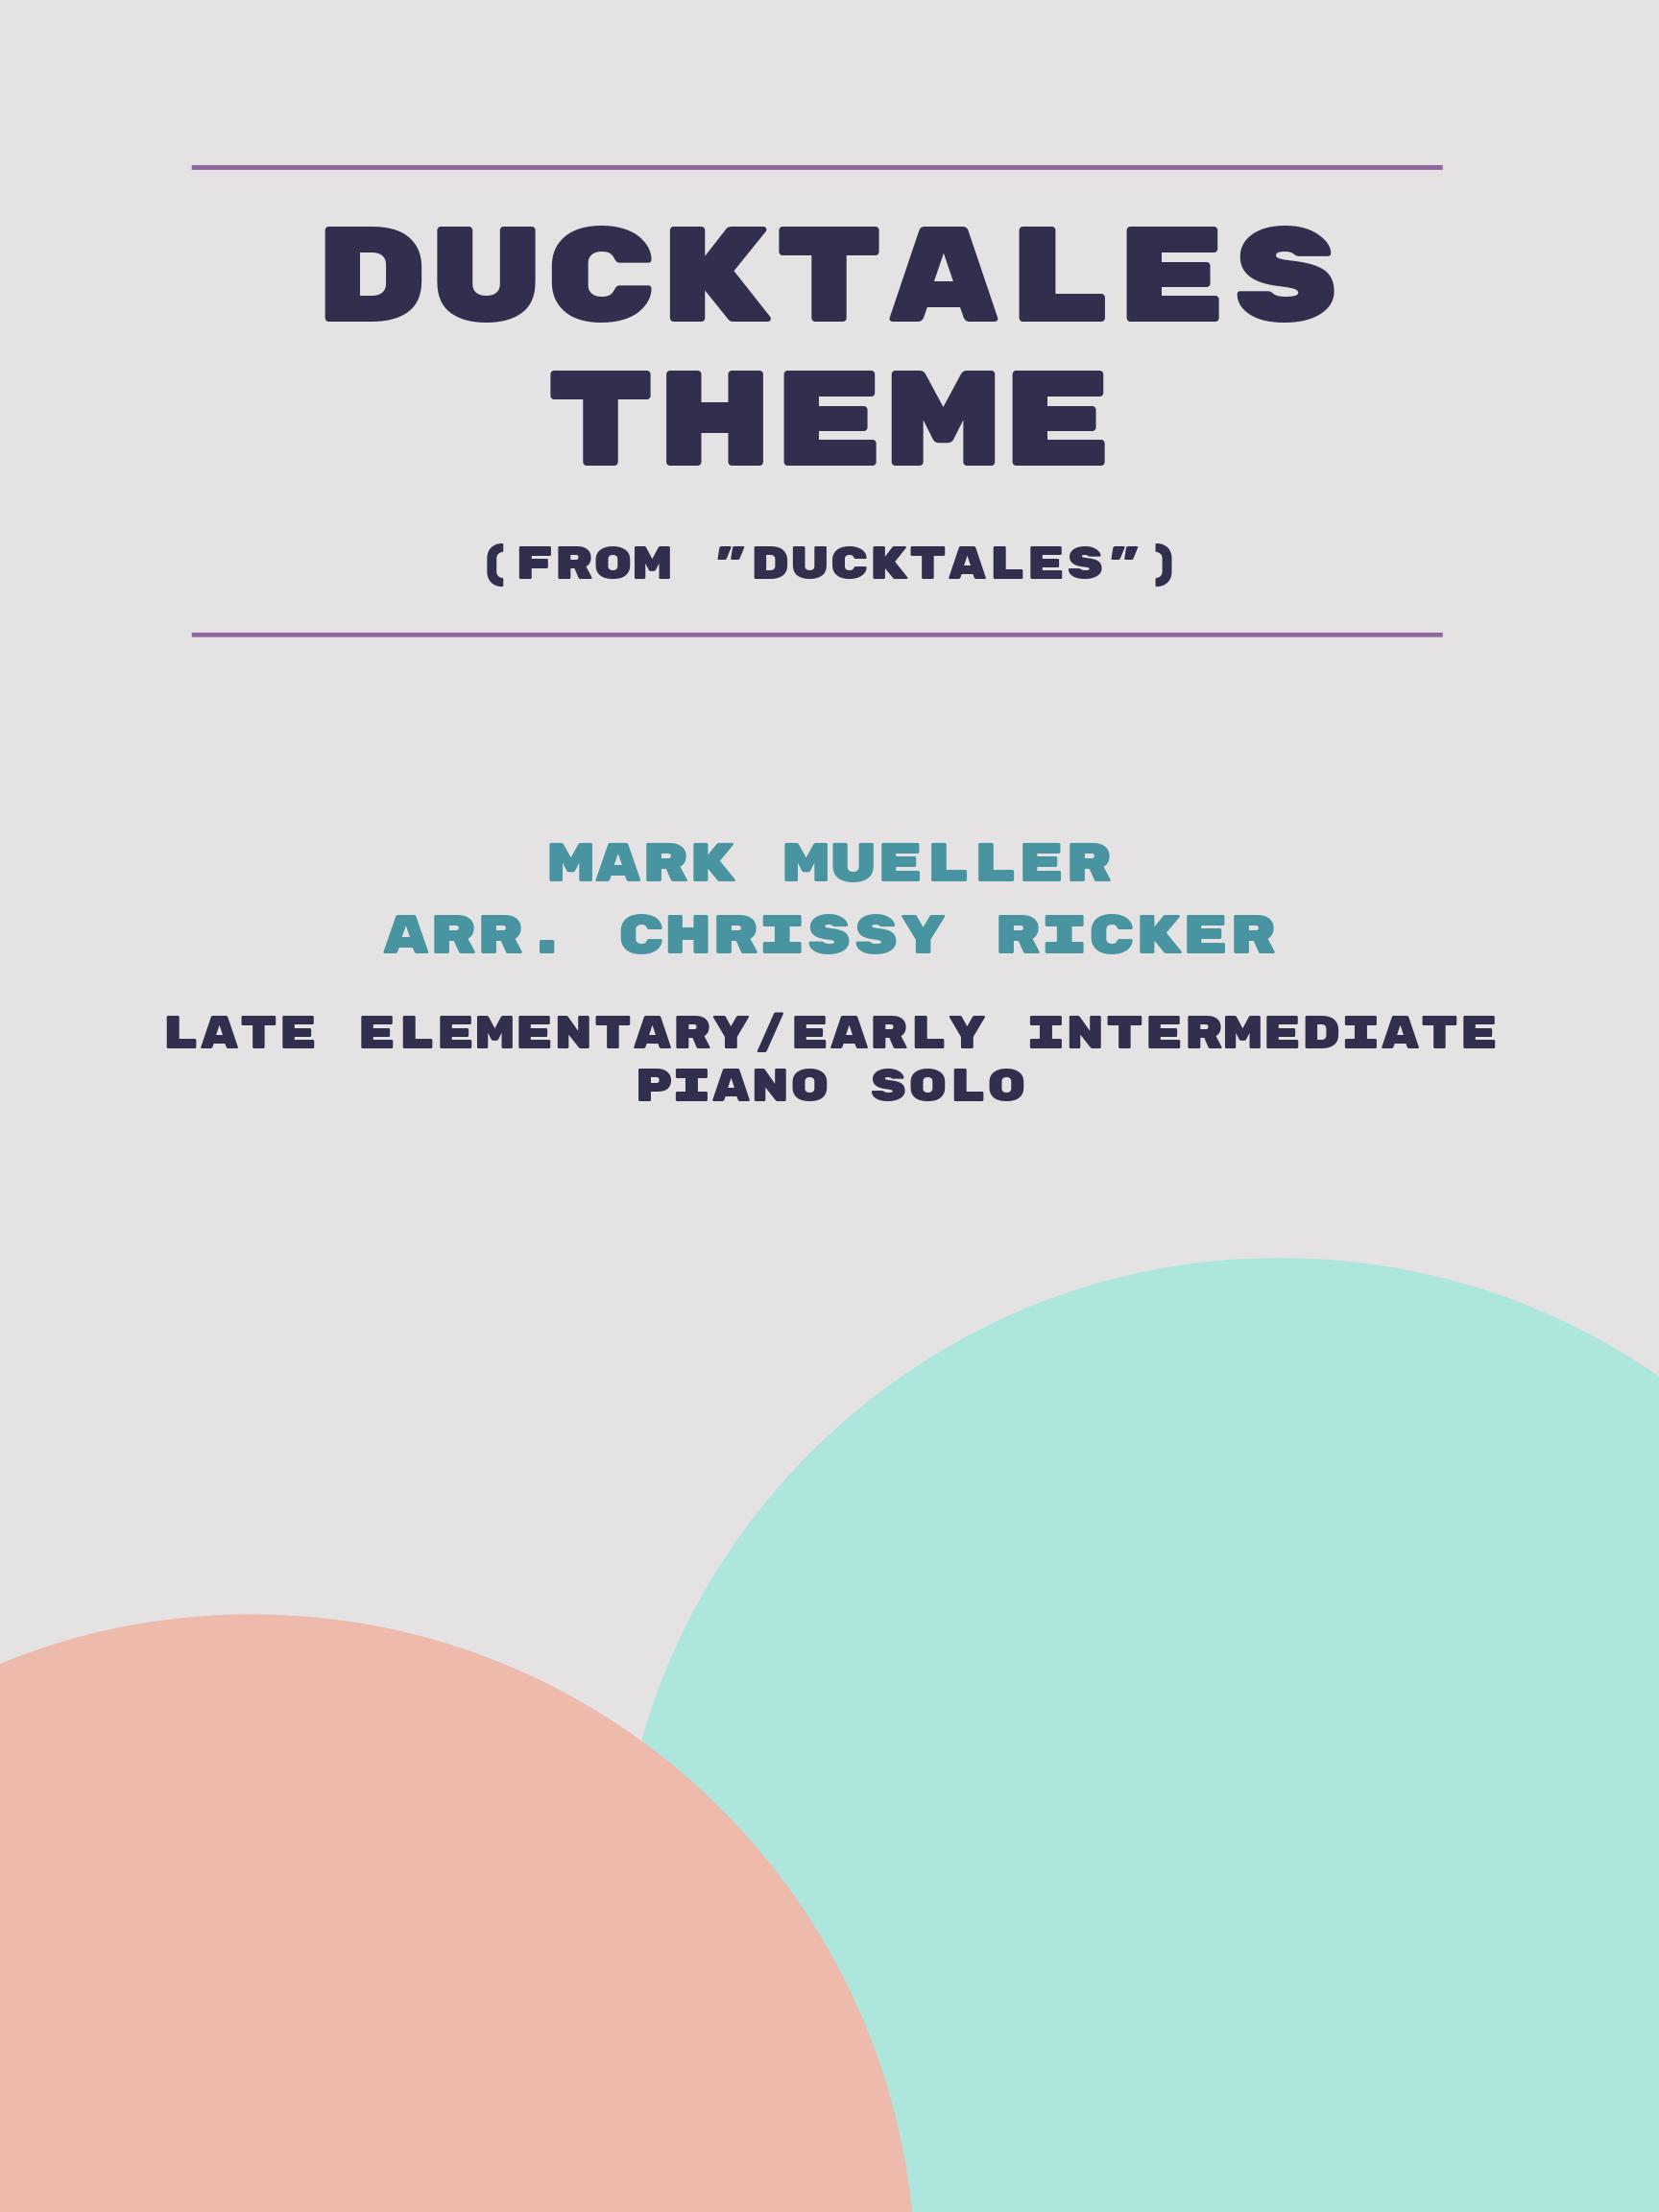 DuckTales Theme by Mark Mueller